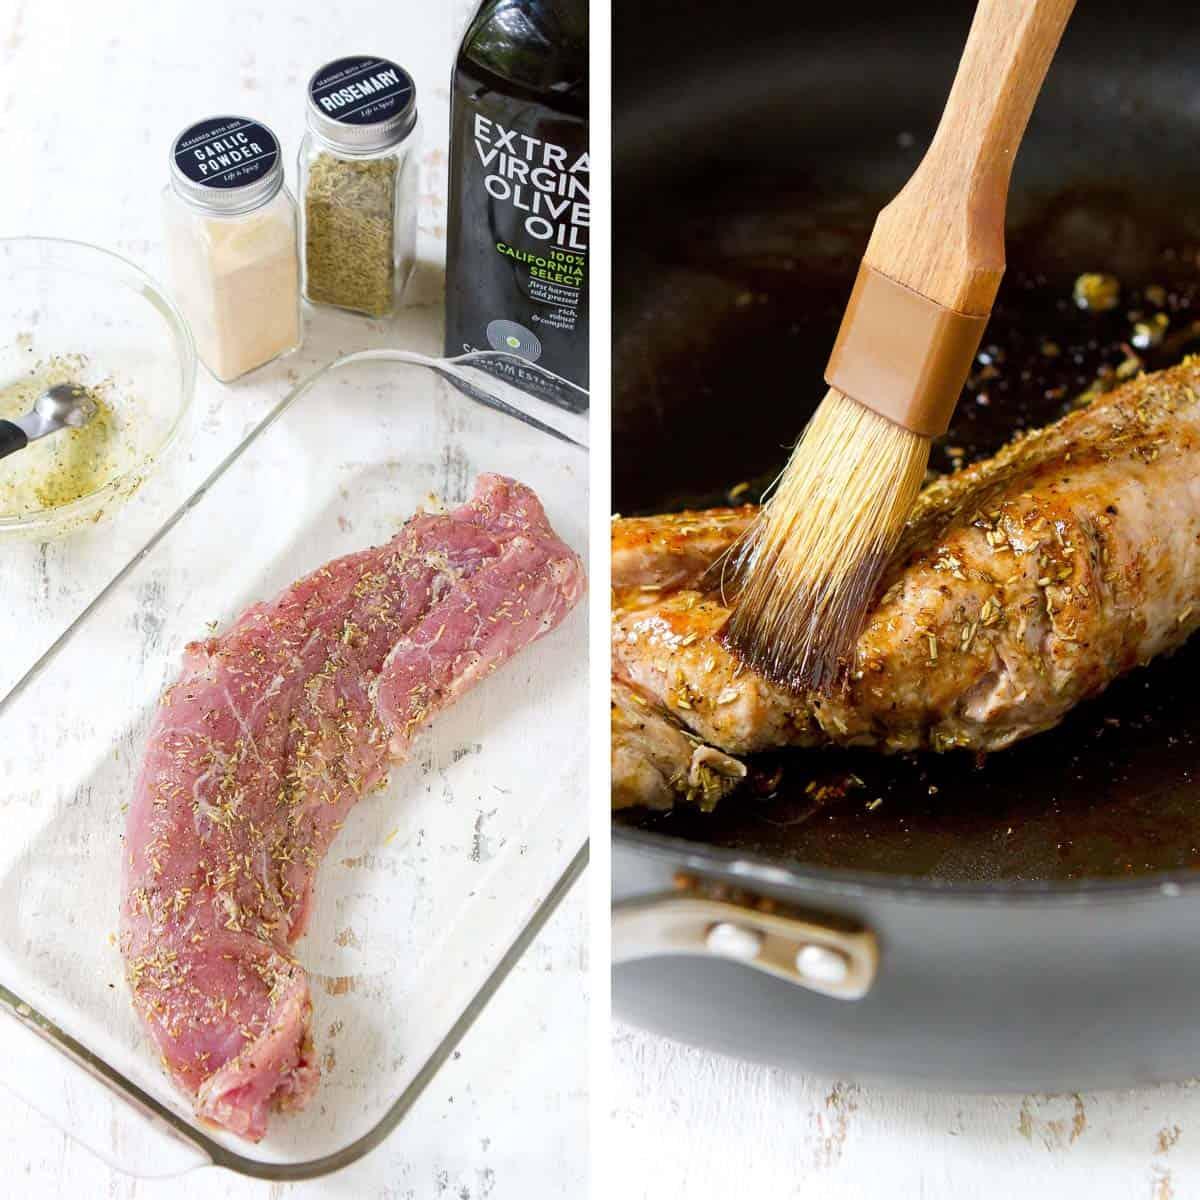 Pork tenderloin in a glass dish and in a black skillet.